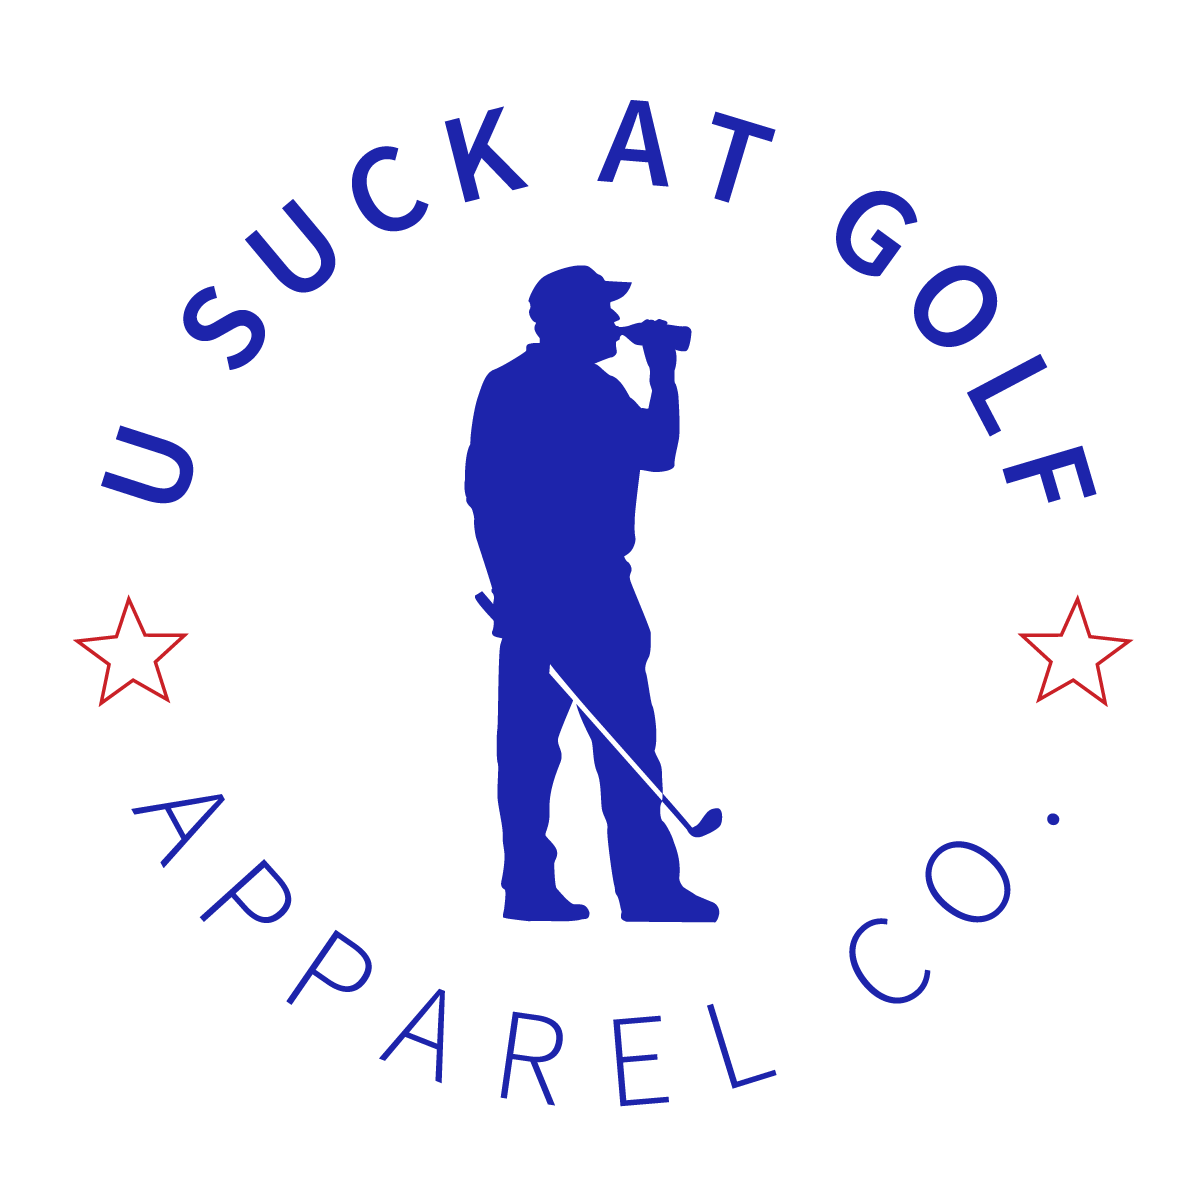 U Suck At Golf coupons and promo codes